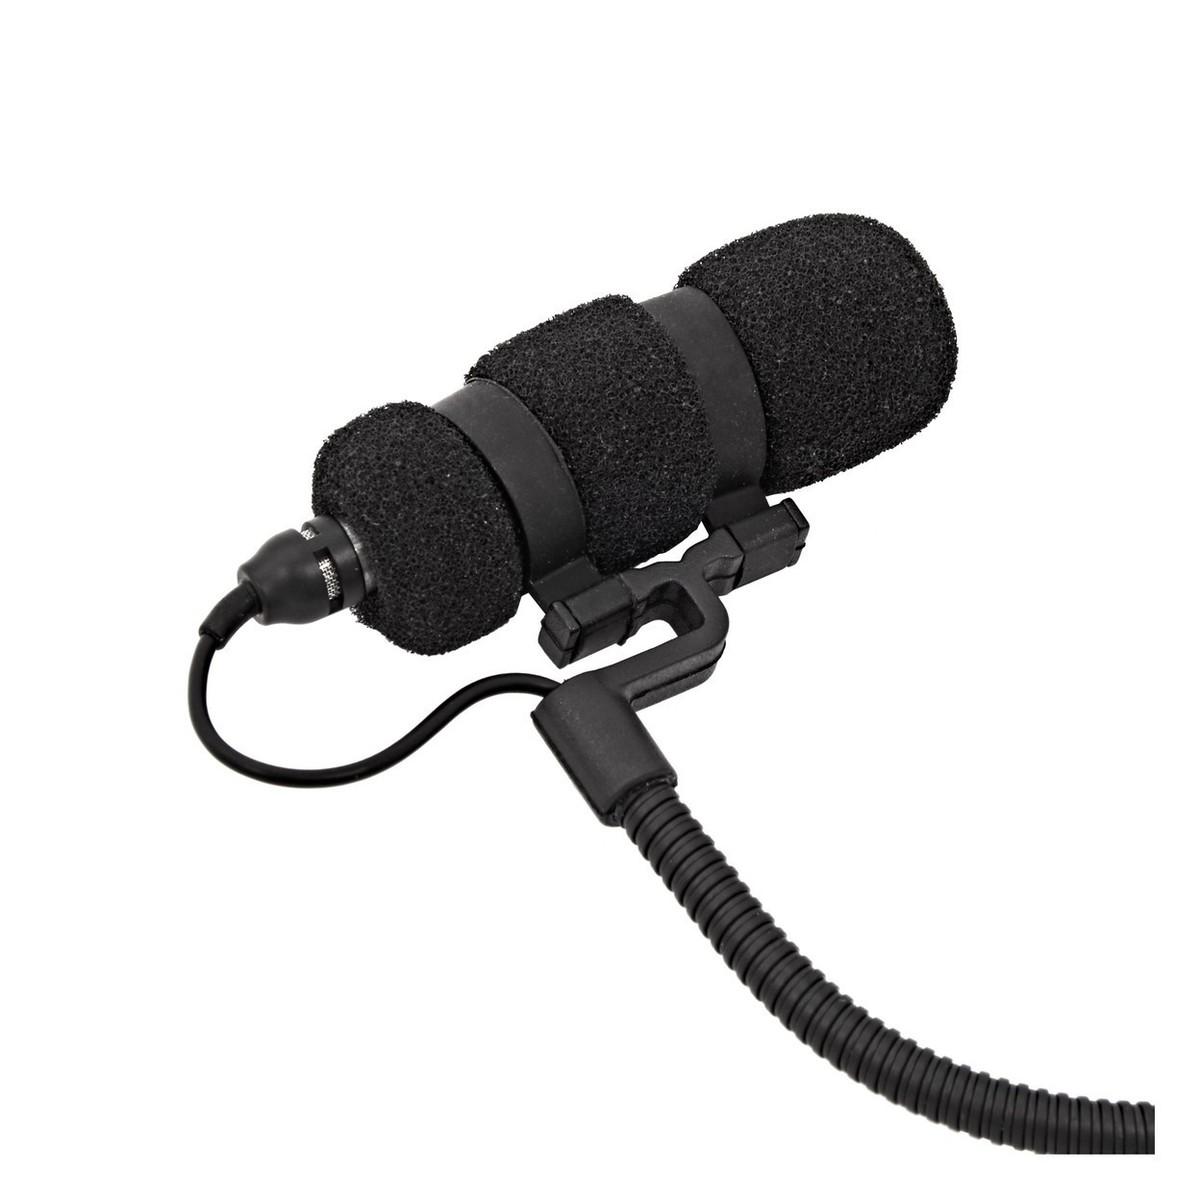 subzero szw 40s wireless instrument mic system at gear4music. Black Bedroom Furniture Sets. Home Design Ideas